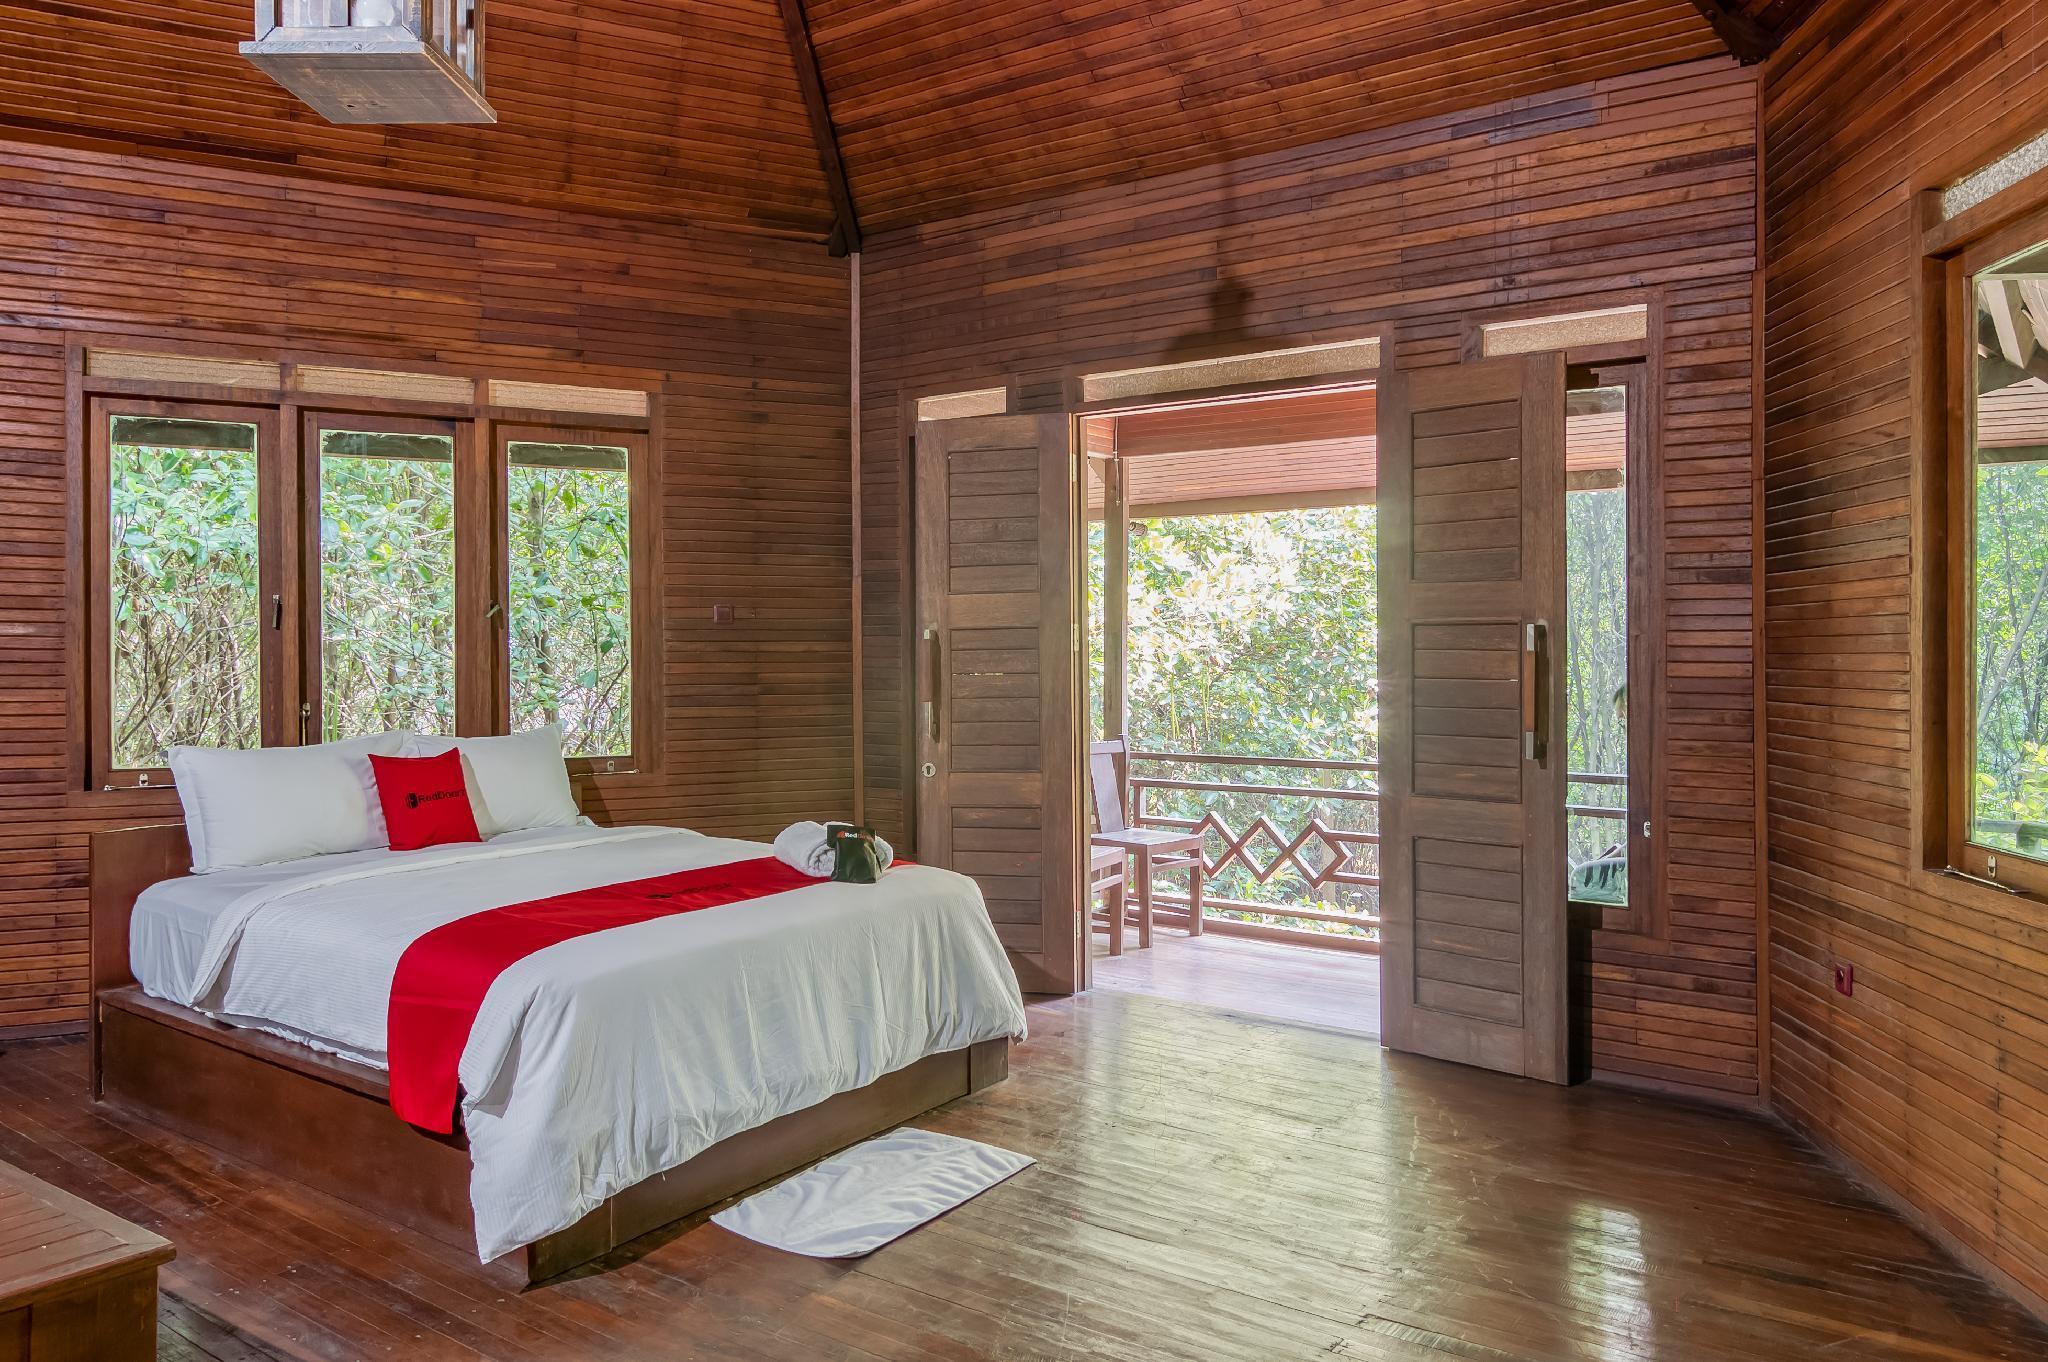 RedDoorz Resort @ Taman Wisata Mangrove